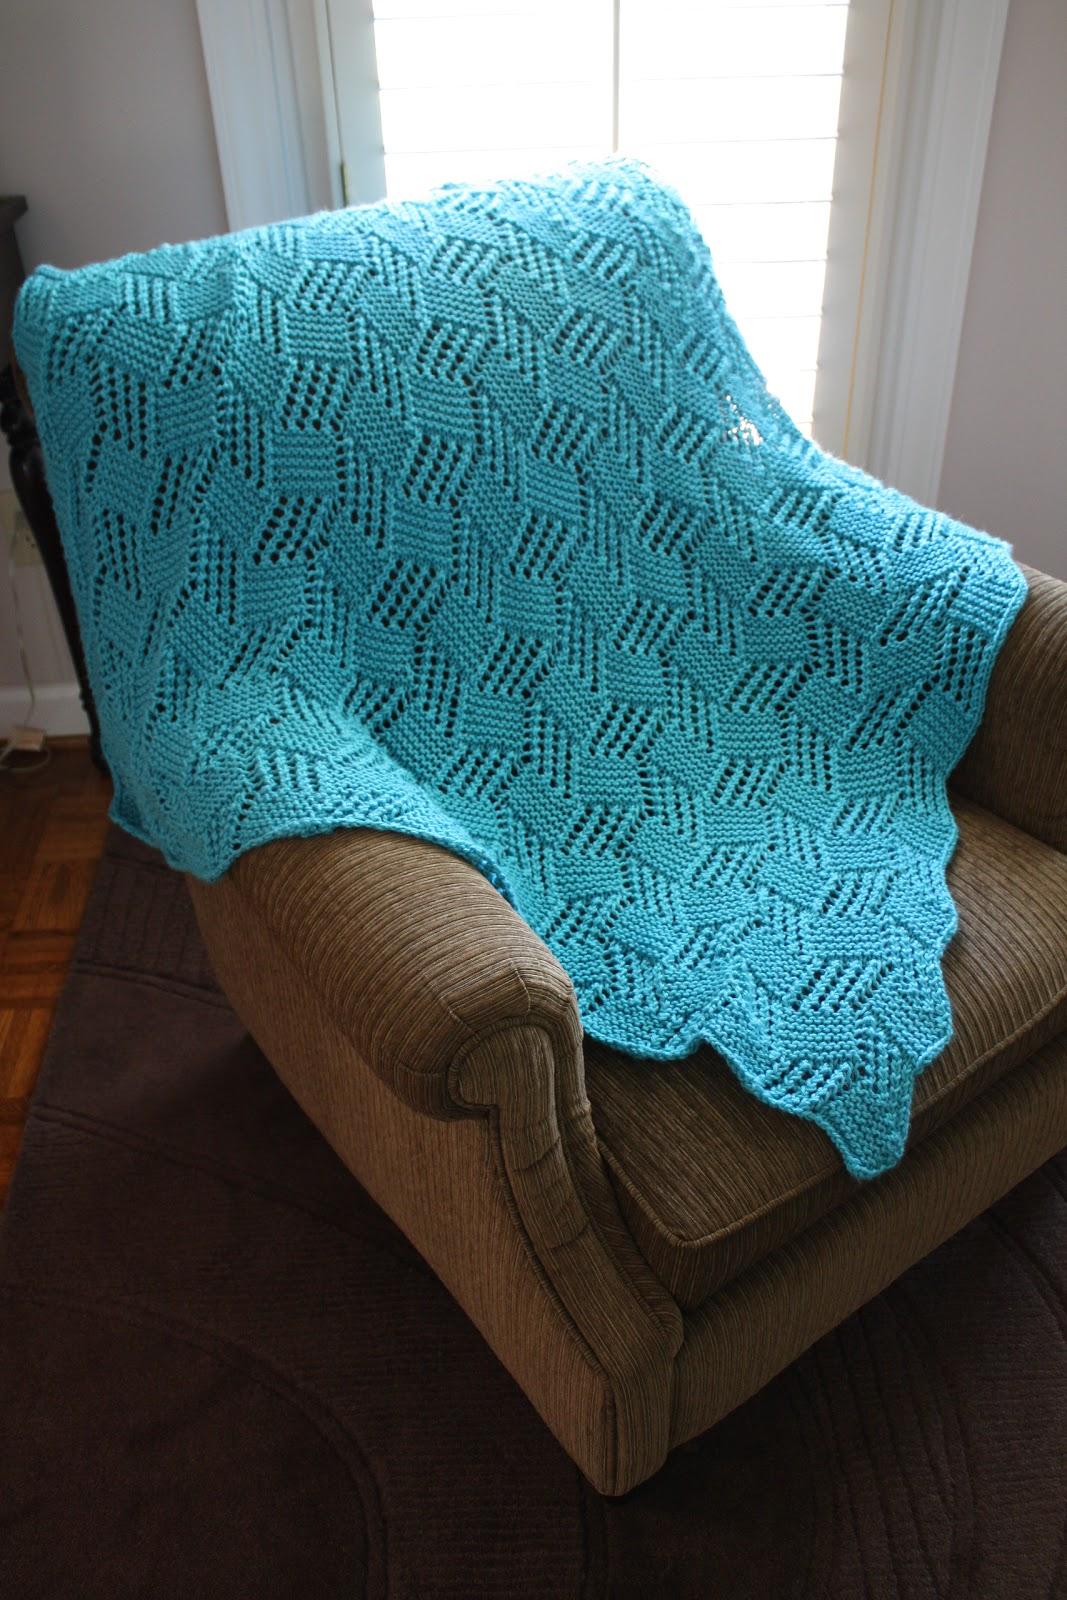 Snapdragon Crafts Big Needle Knit Afghans Lace Block